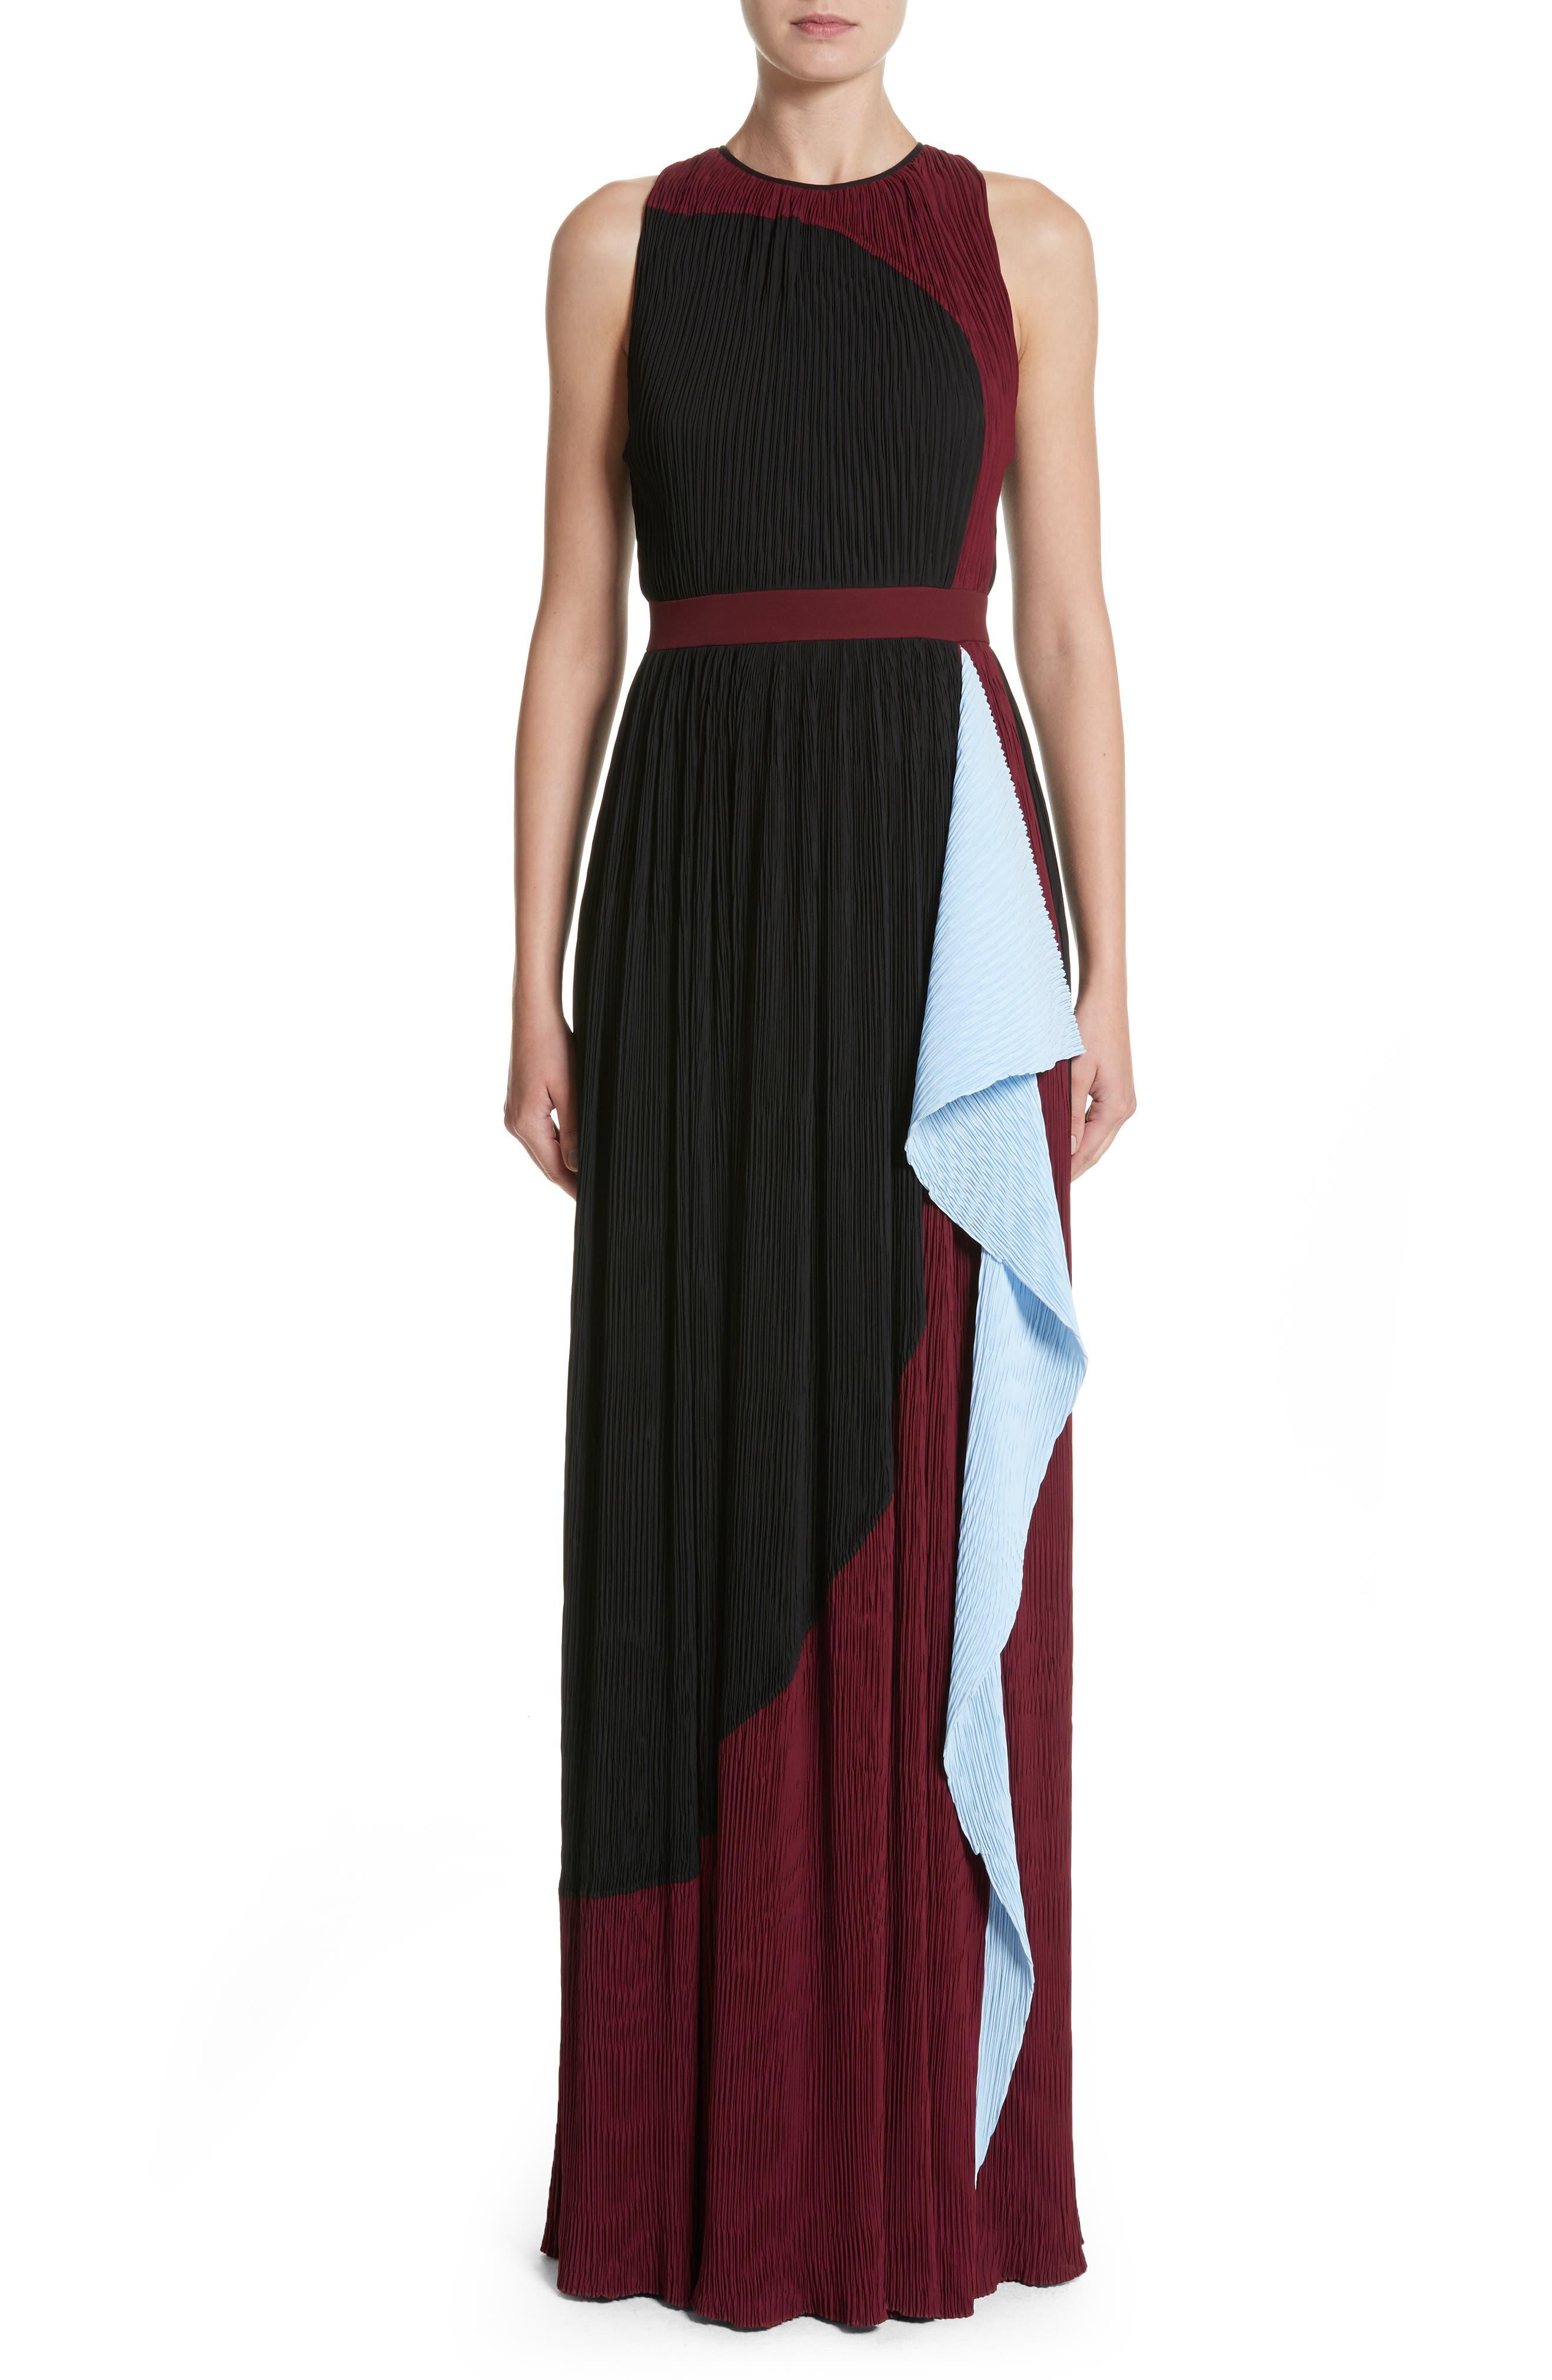 Milda Crystal Pleat Dress,                             Main thumbnail 1, color,                             010